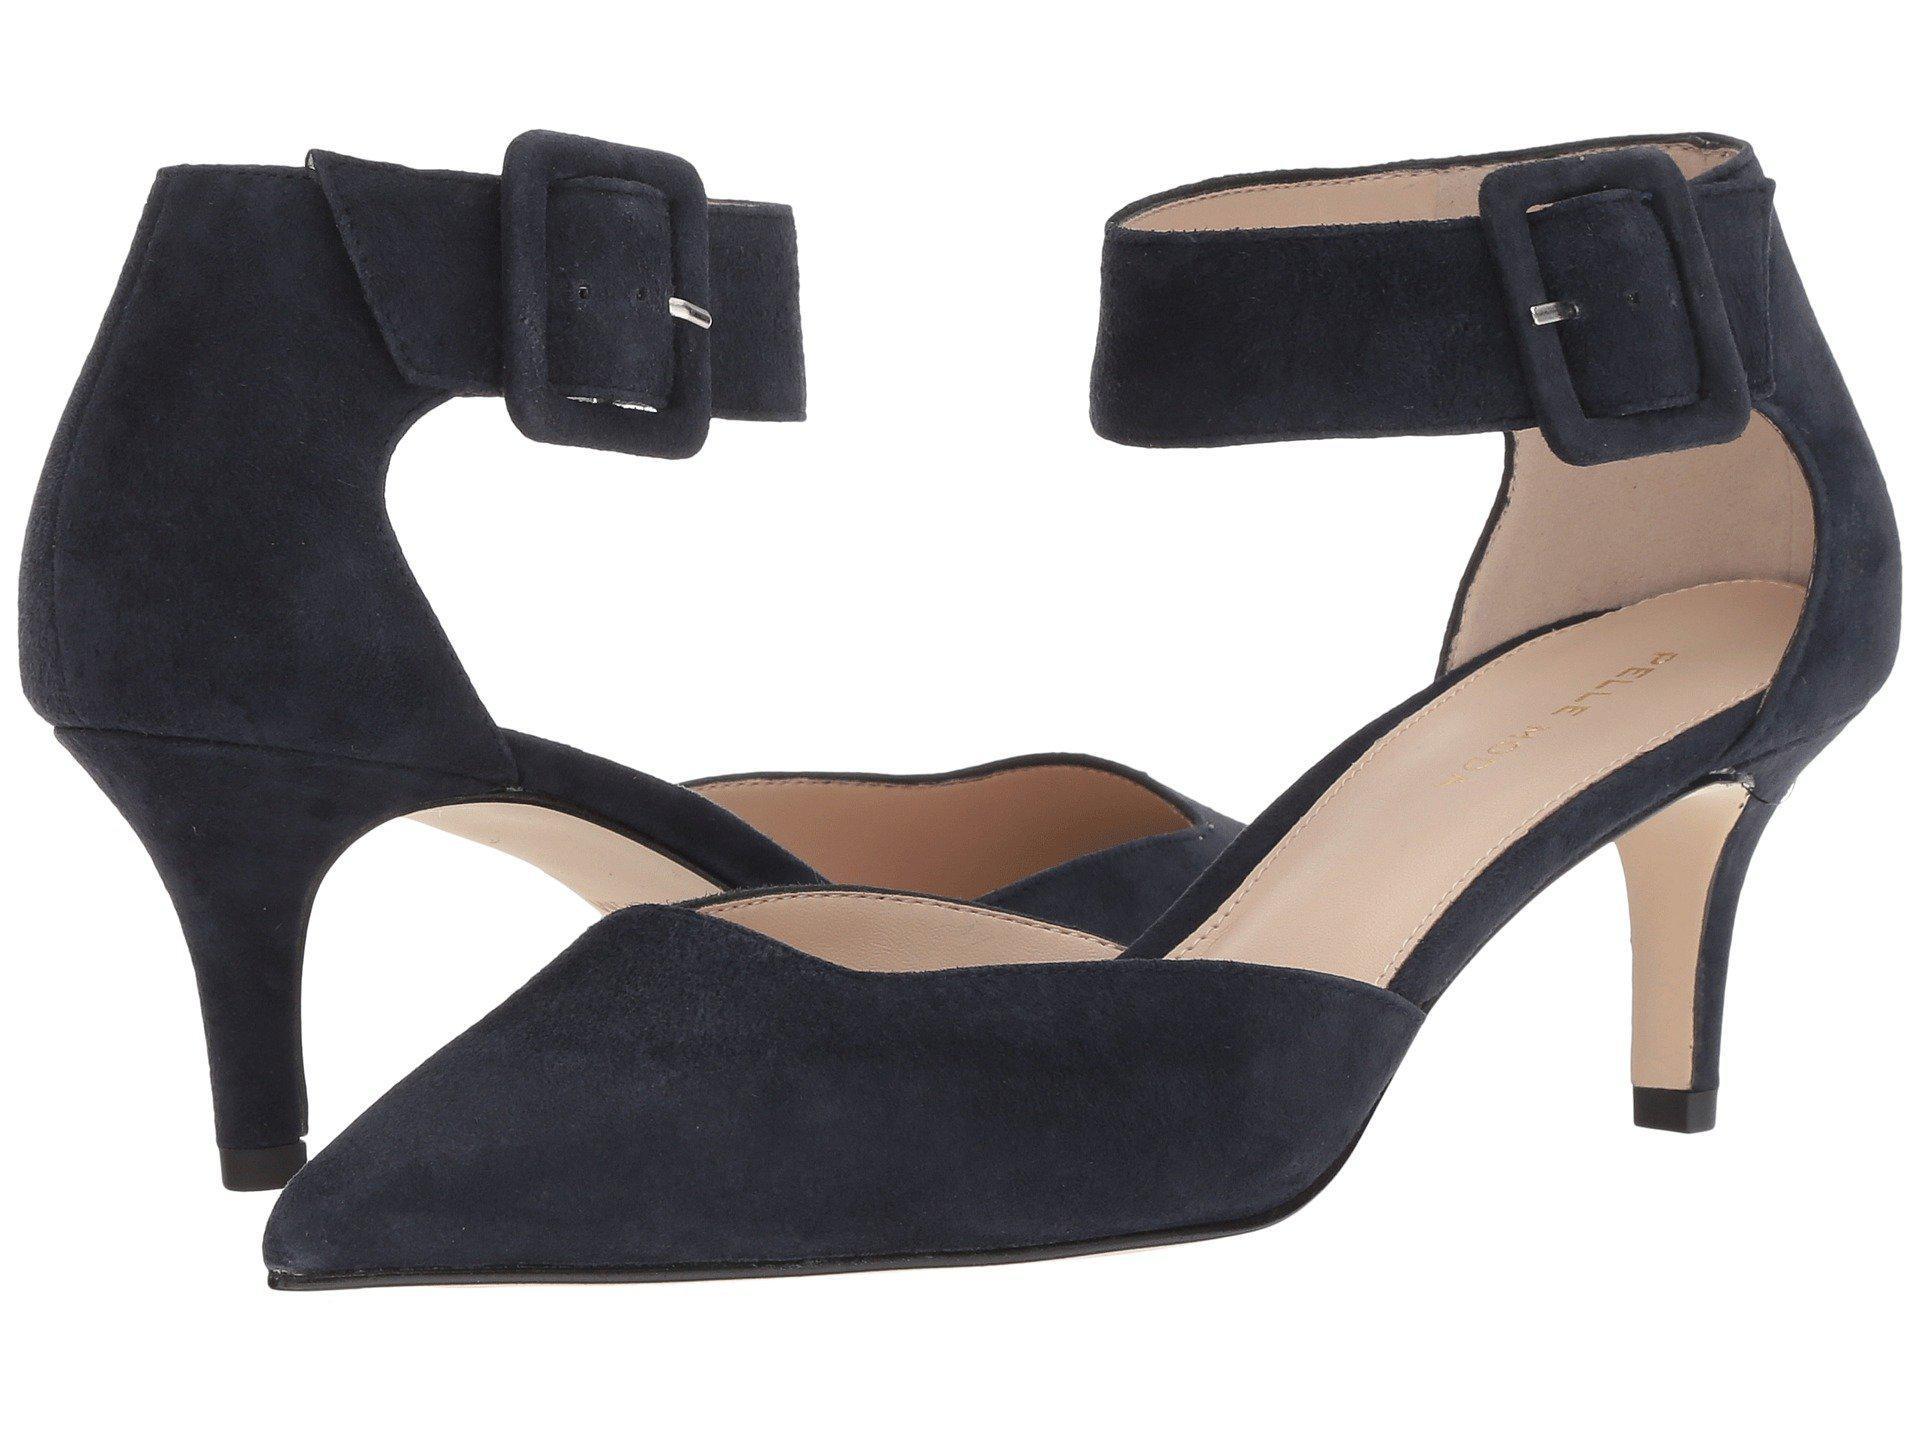 80d658c9cef5 Lyst - Pelle Moda Kenley (black Suede) Women s Shoes